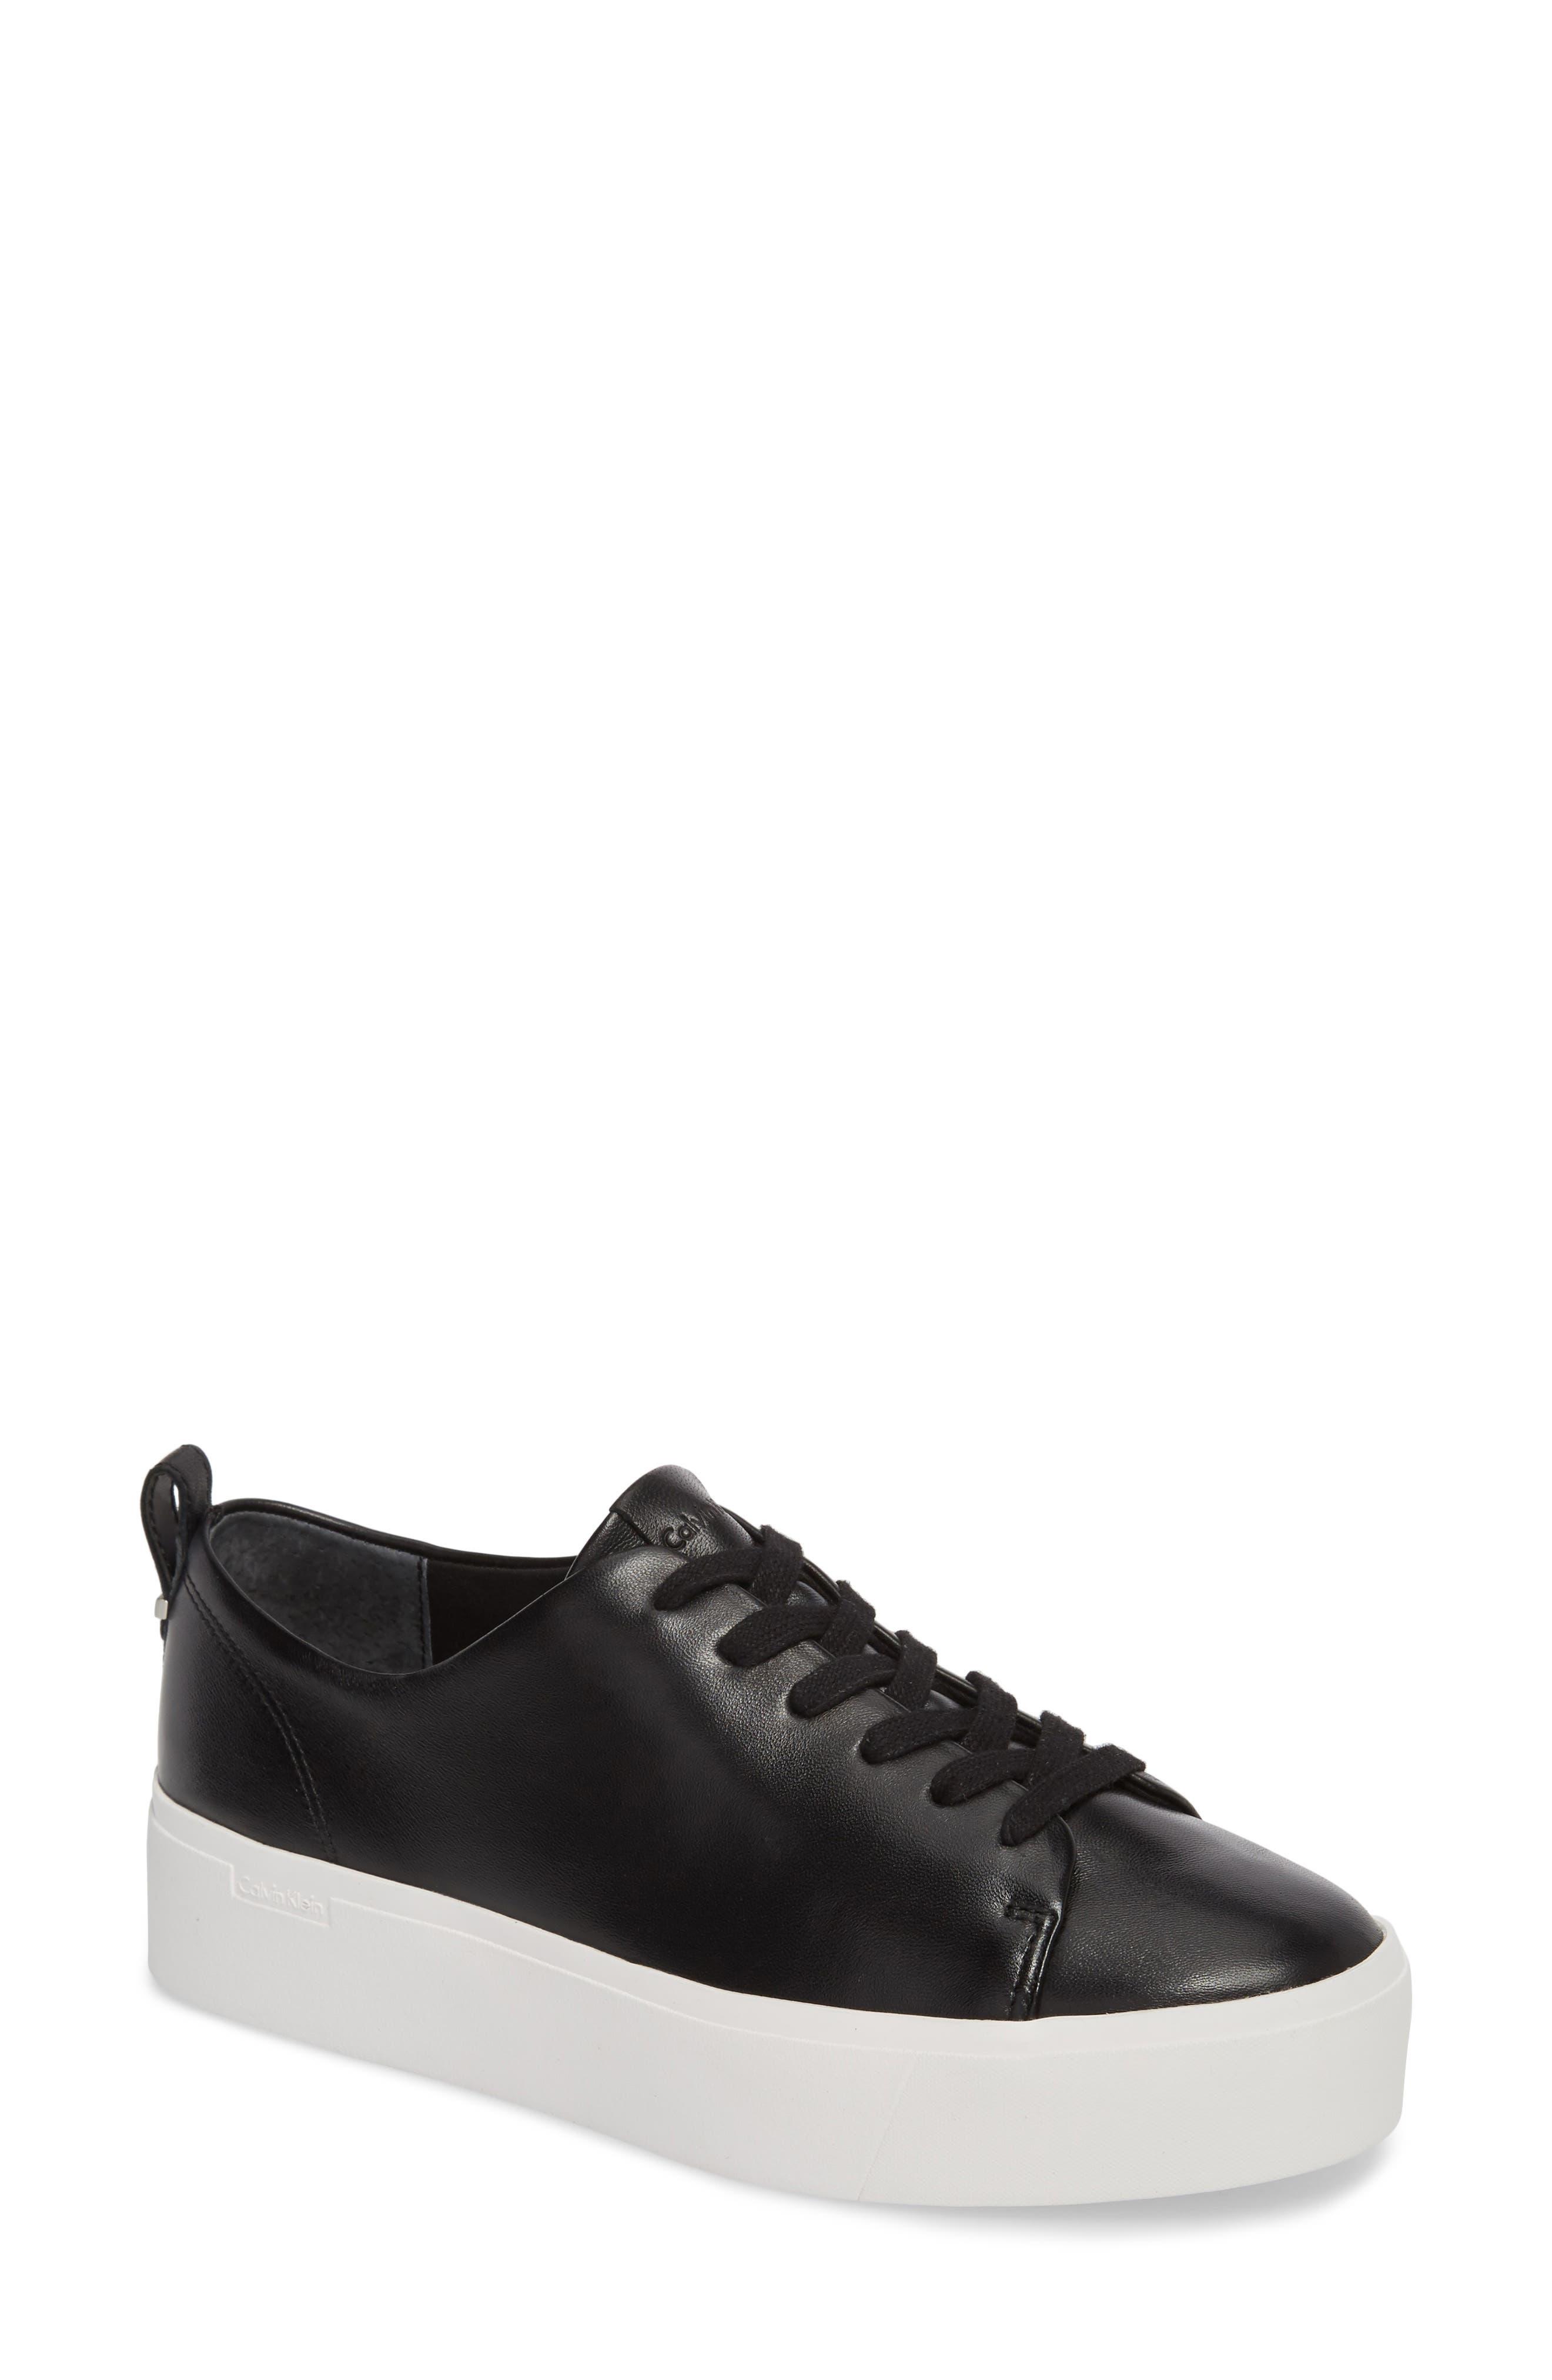 Janet Platform Sneaker,                             Main thumbnail 1, color,